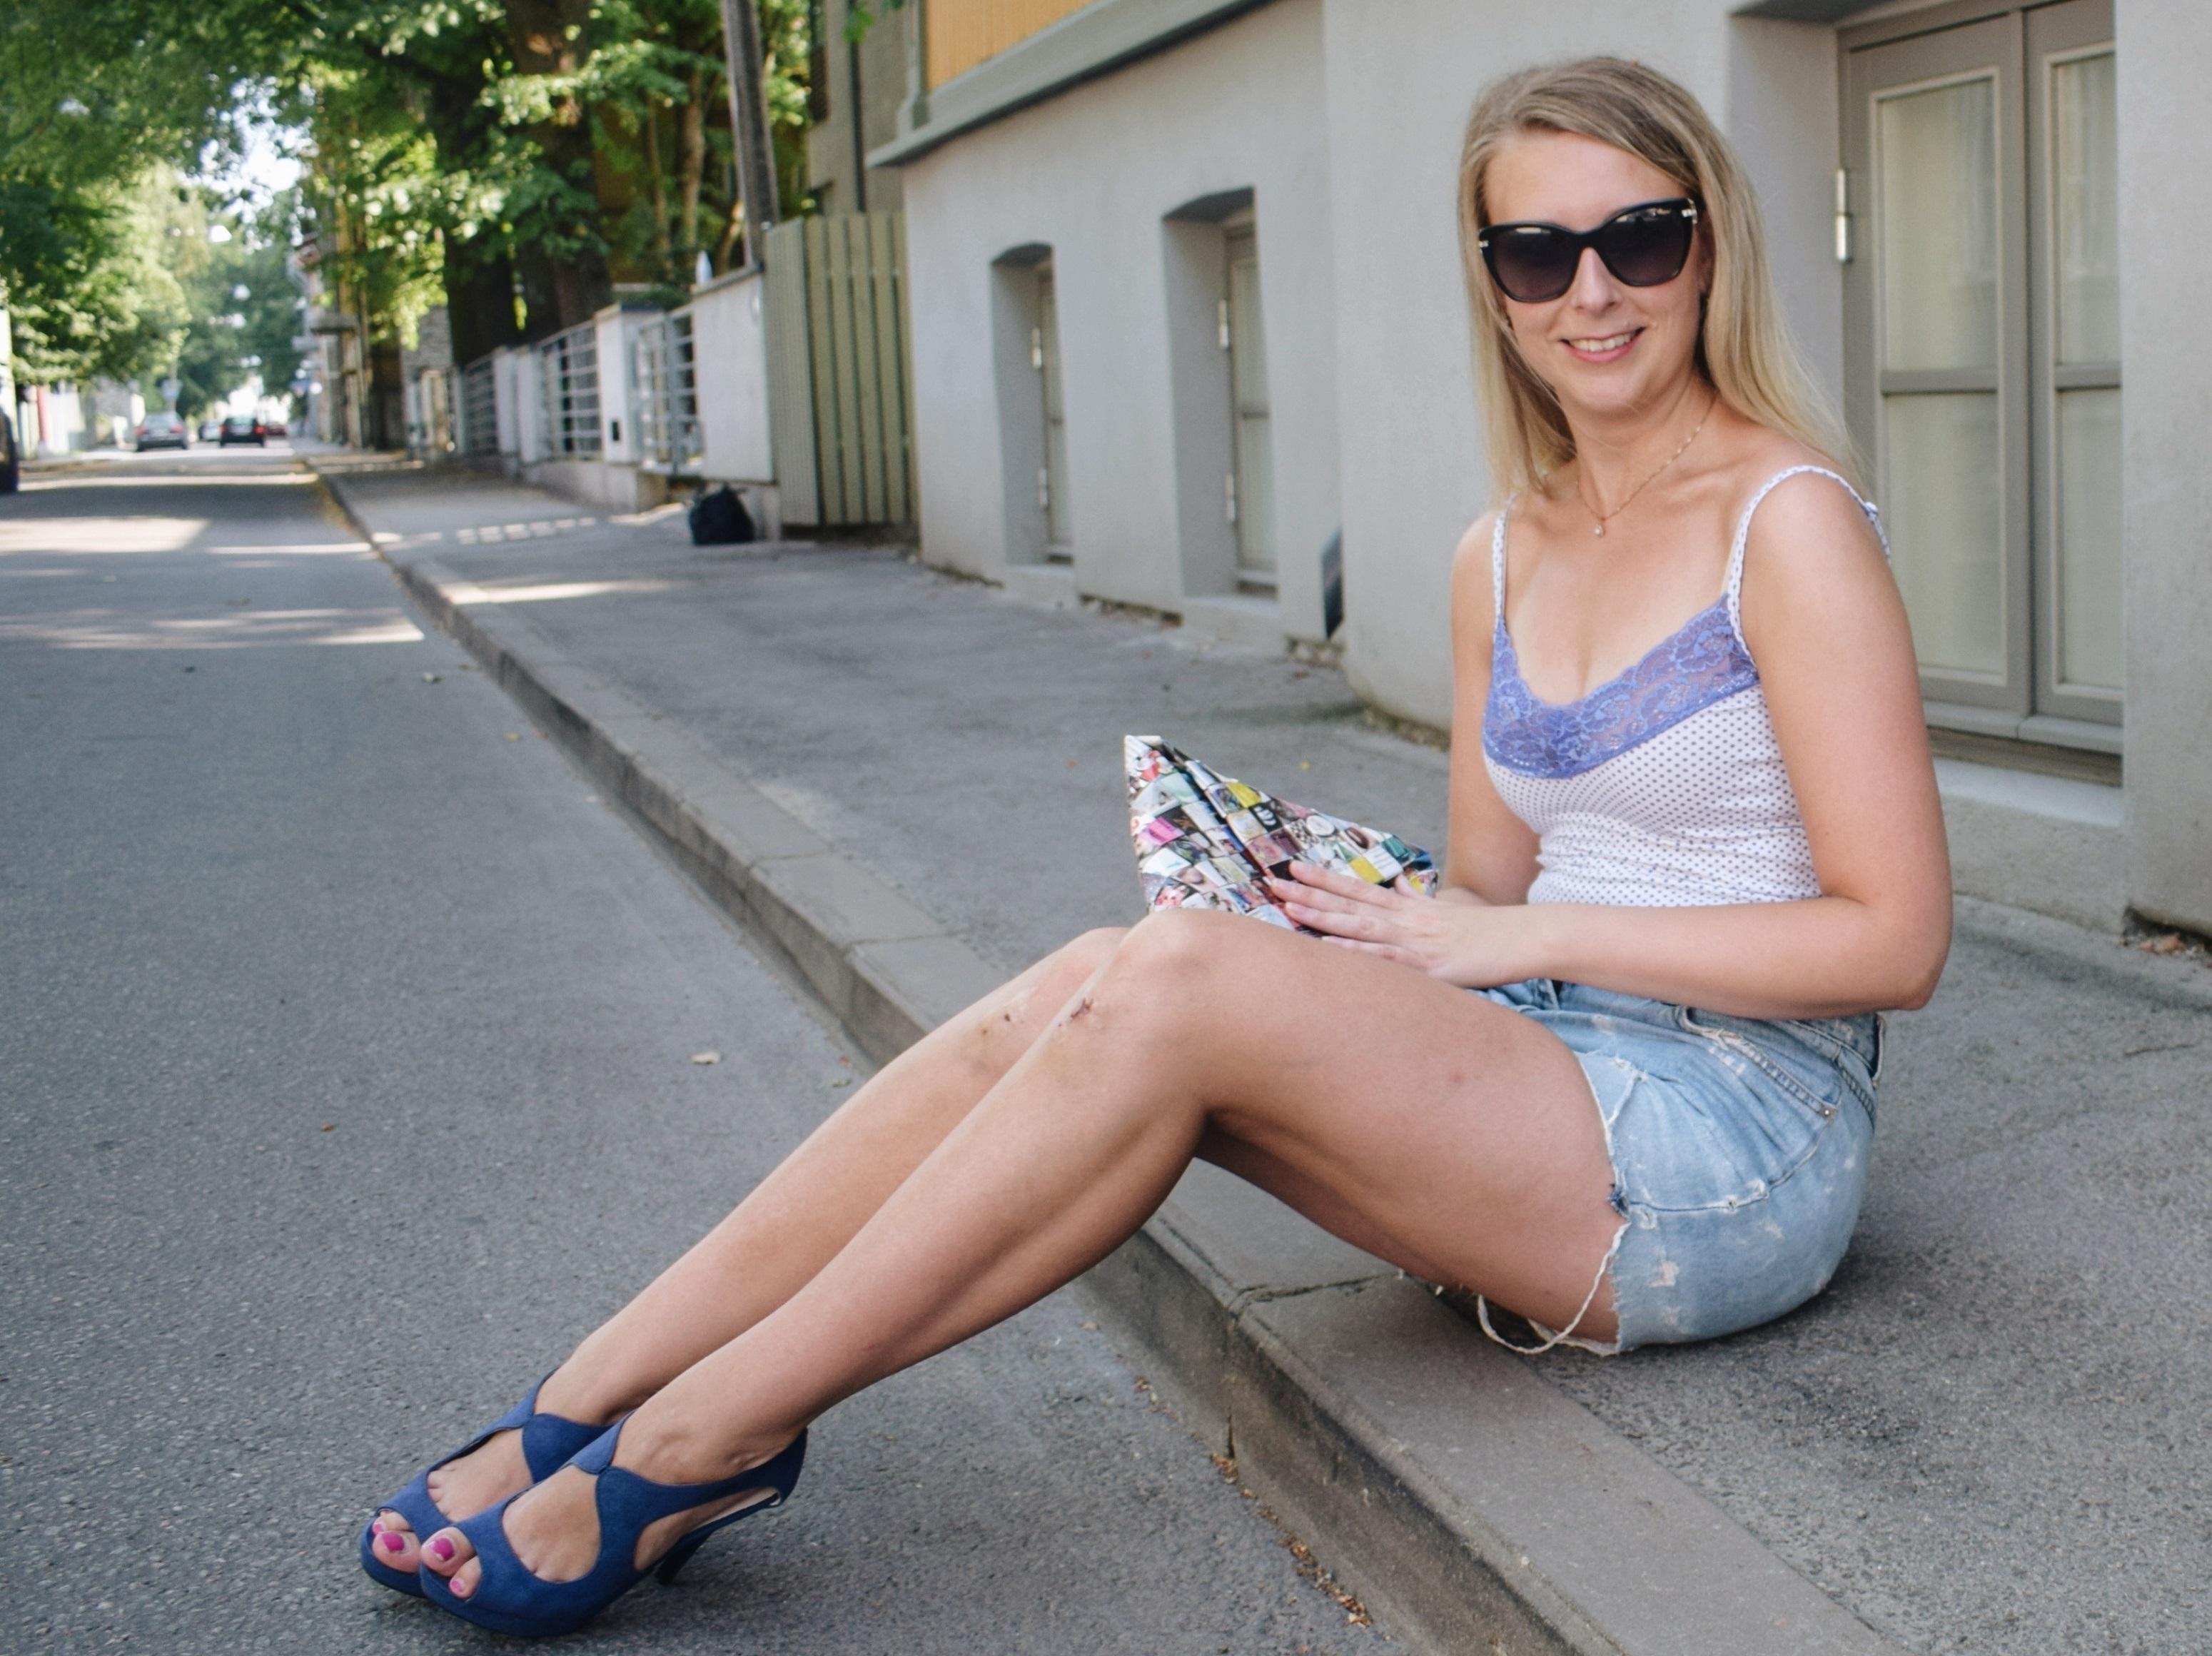 Outlandish blog sensitivity Winning Tactics Surviving Rainy Days Model outfit